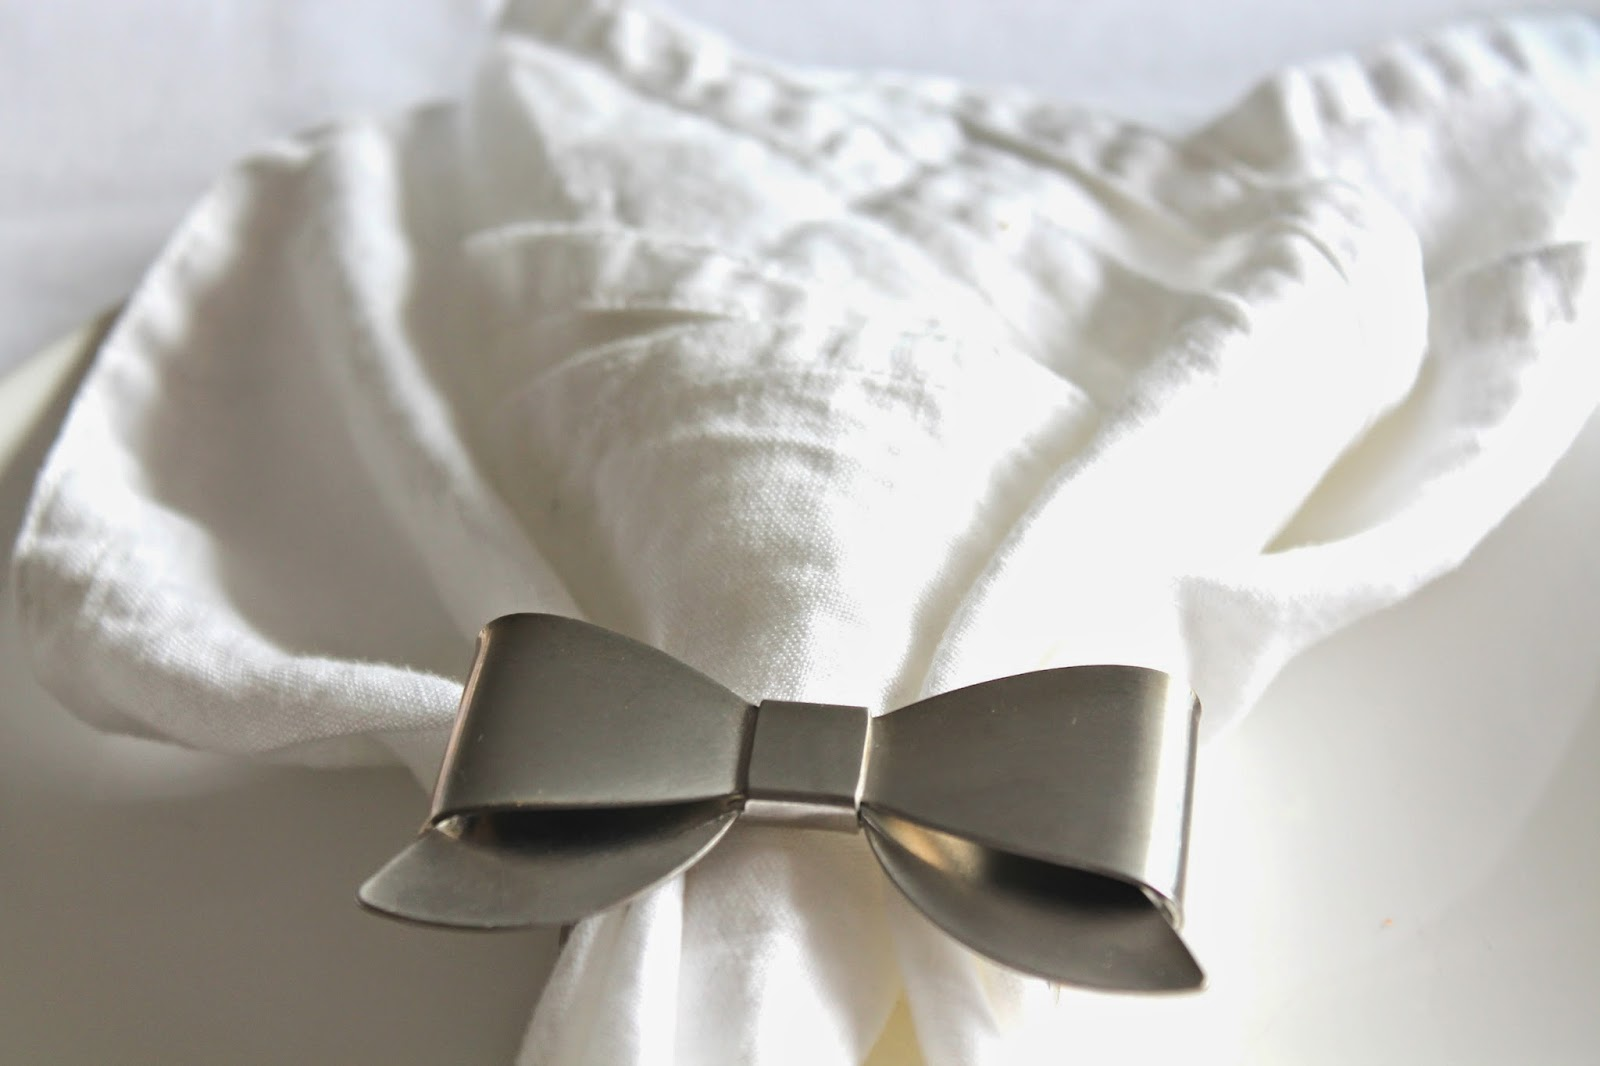 Napkins and a bow napkinrings